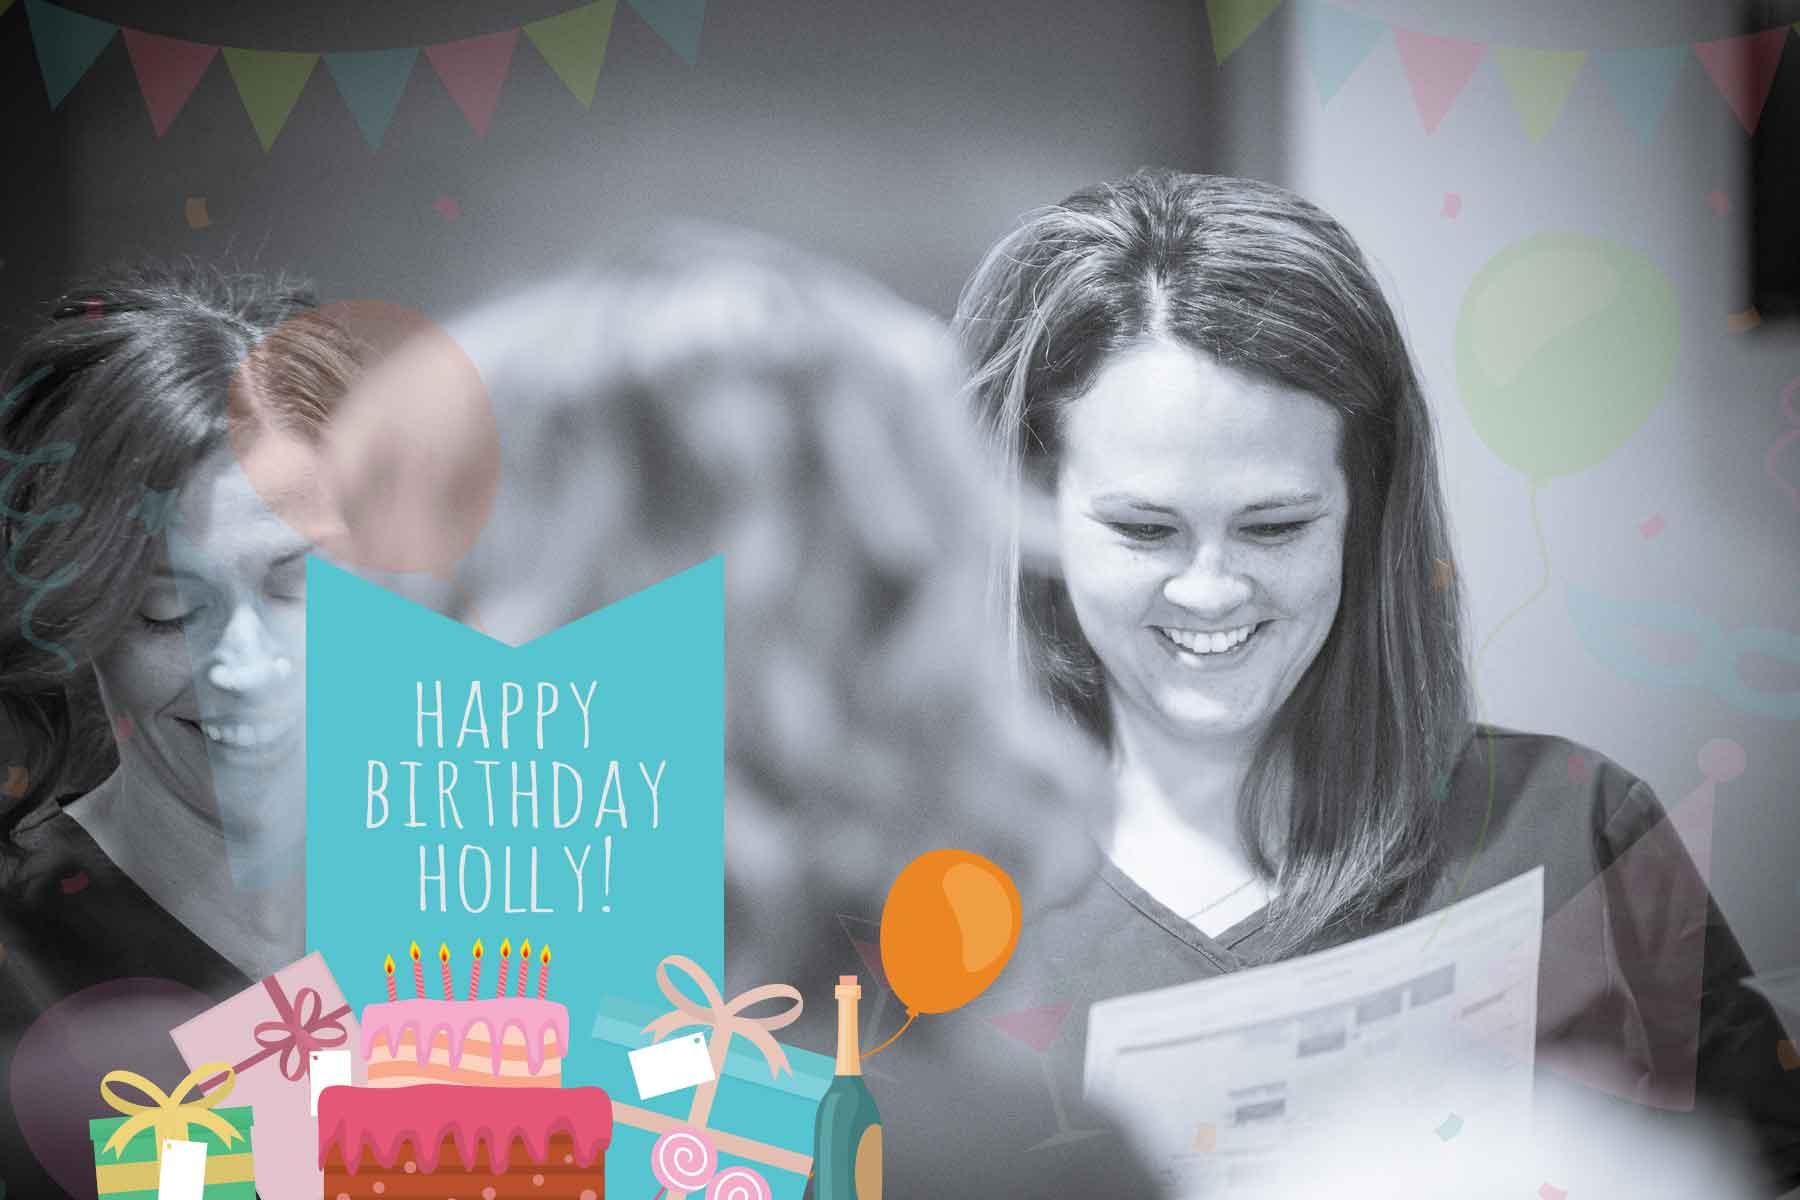 holly-birthday It's Holly's Birthday!!!